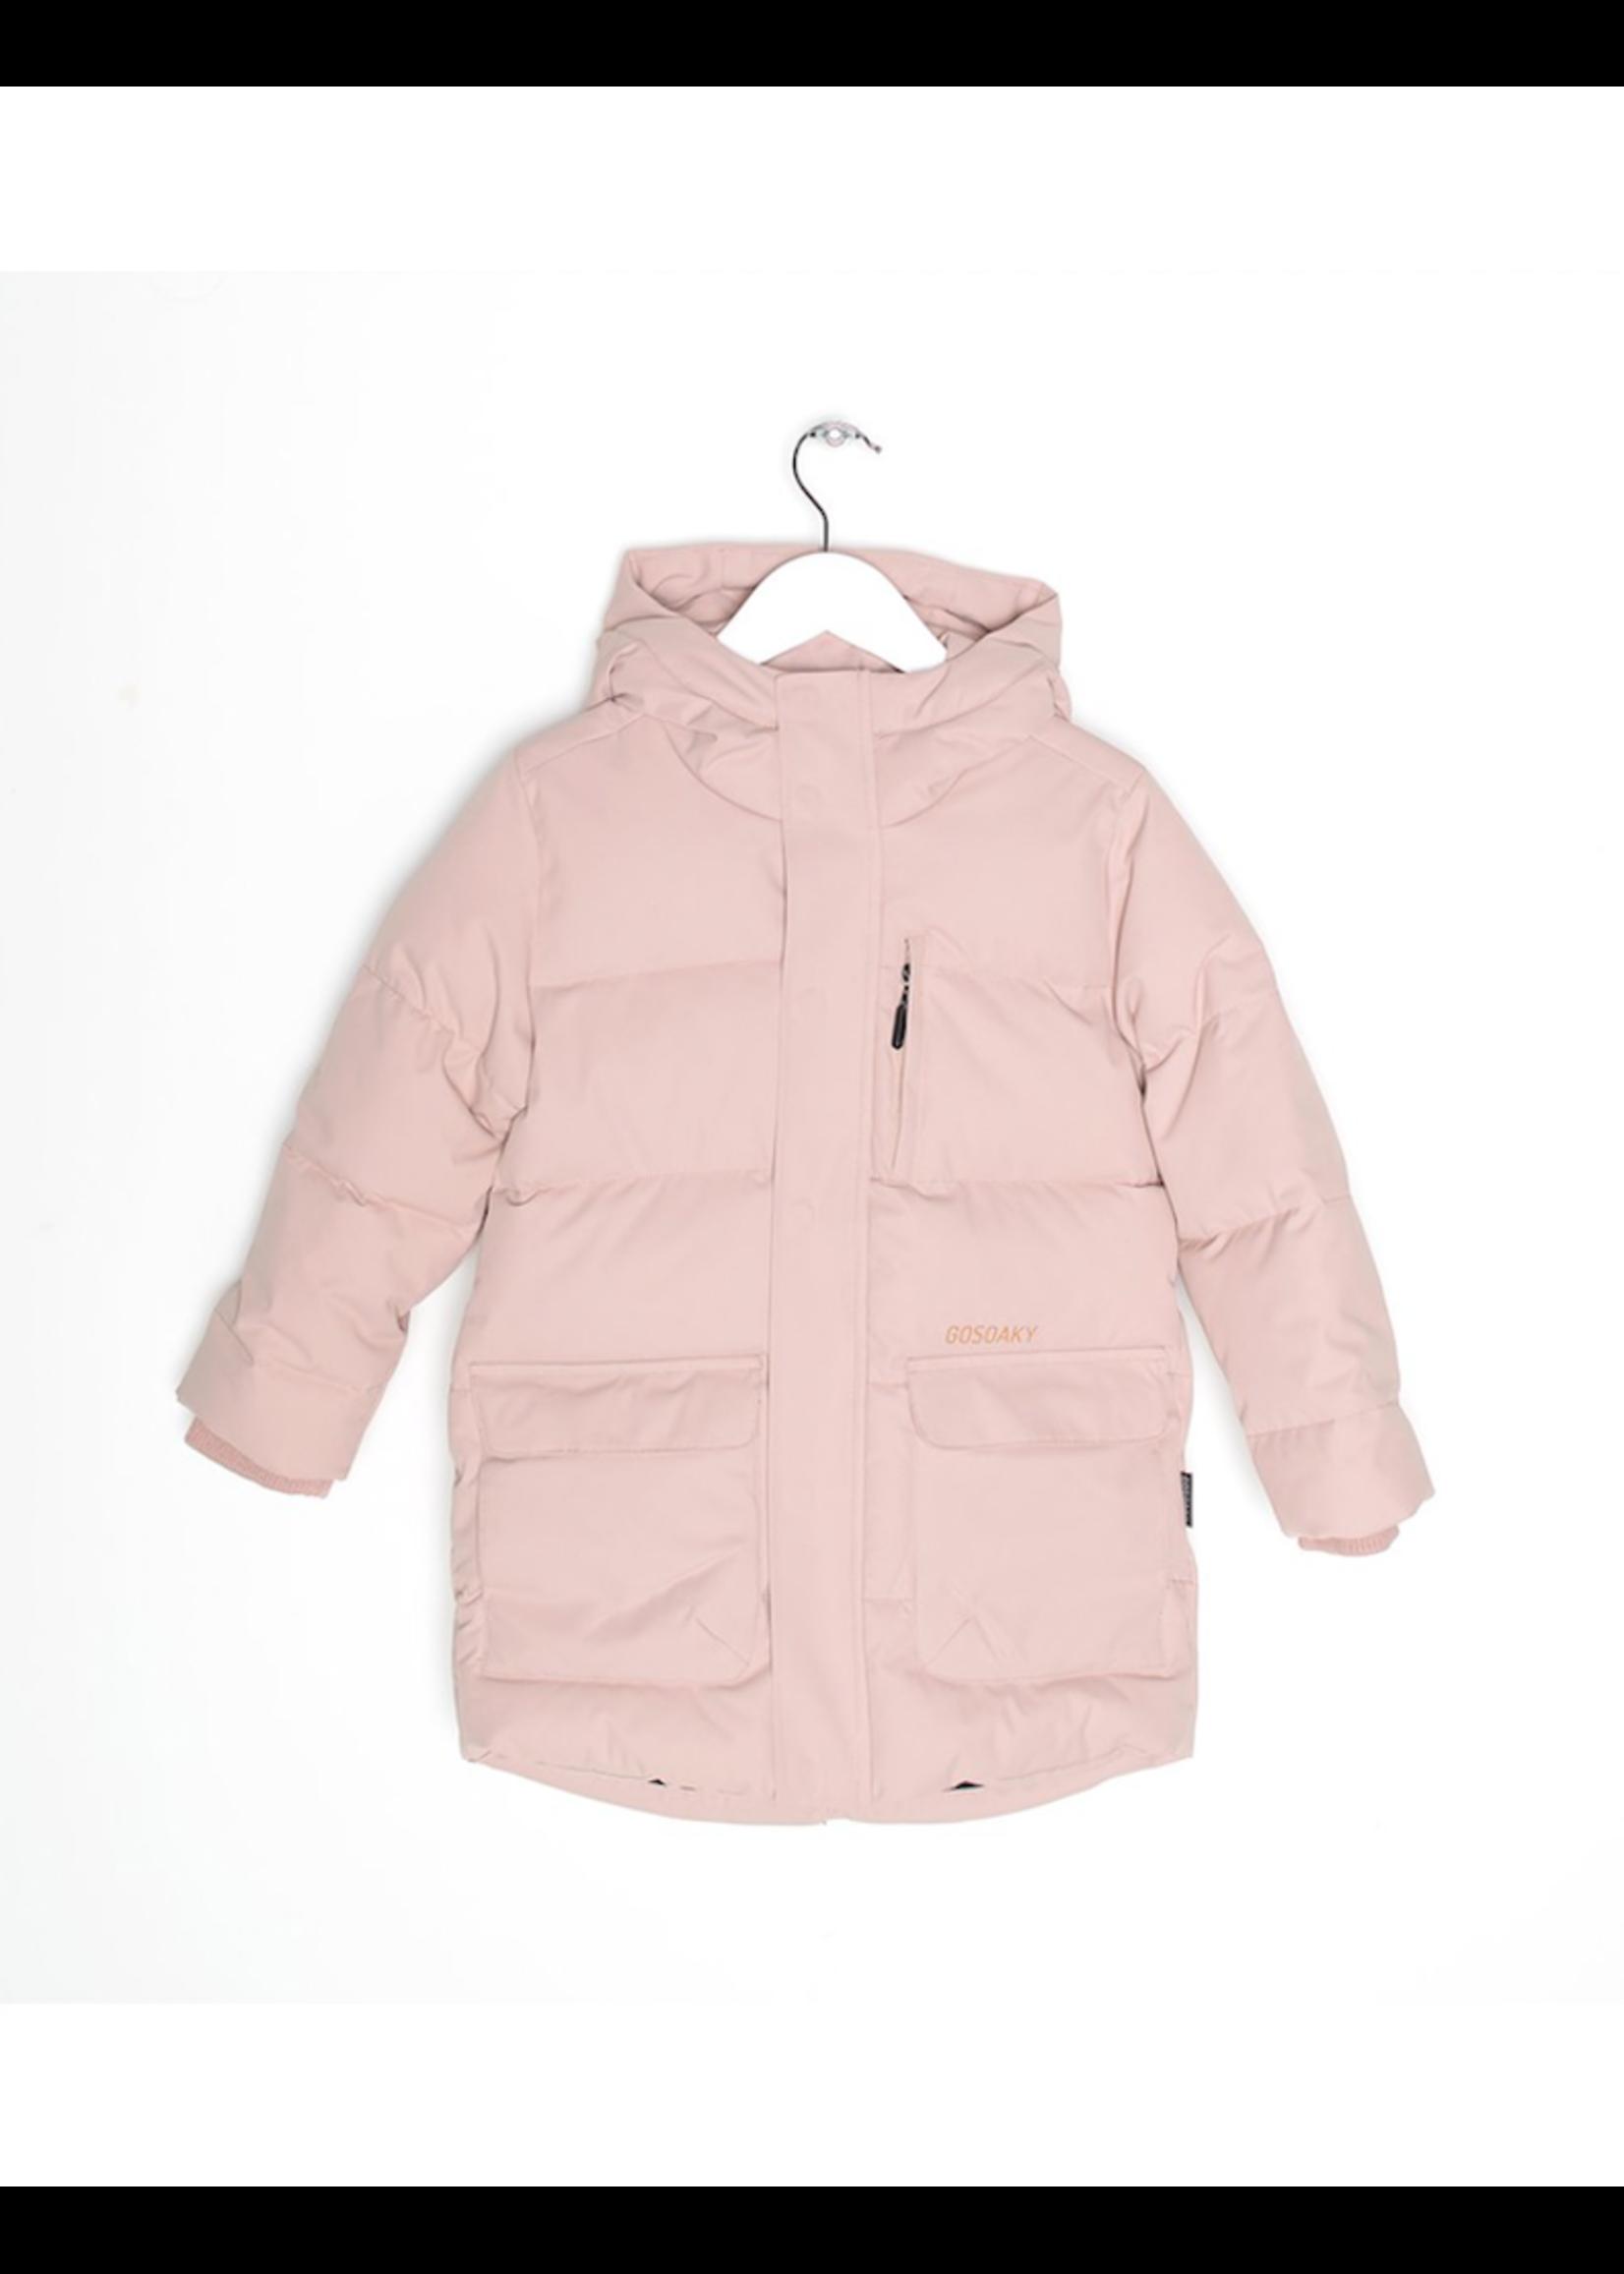 Go Soaky GoSoaky, Tiger Eye Puffer Jacket In Evening Pink